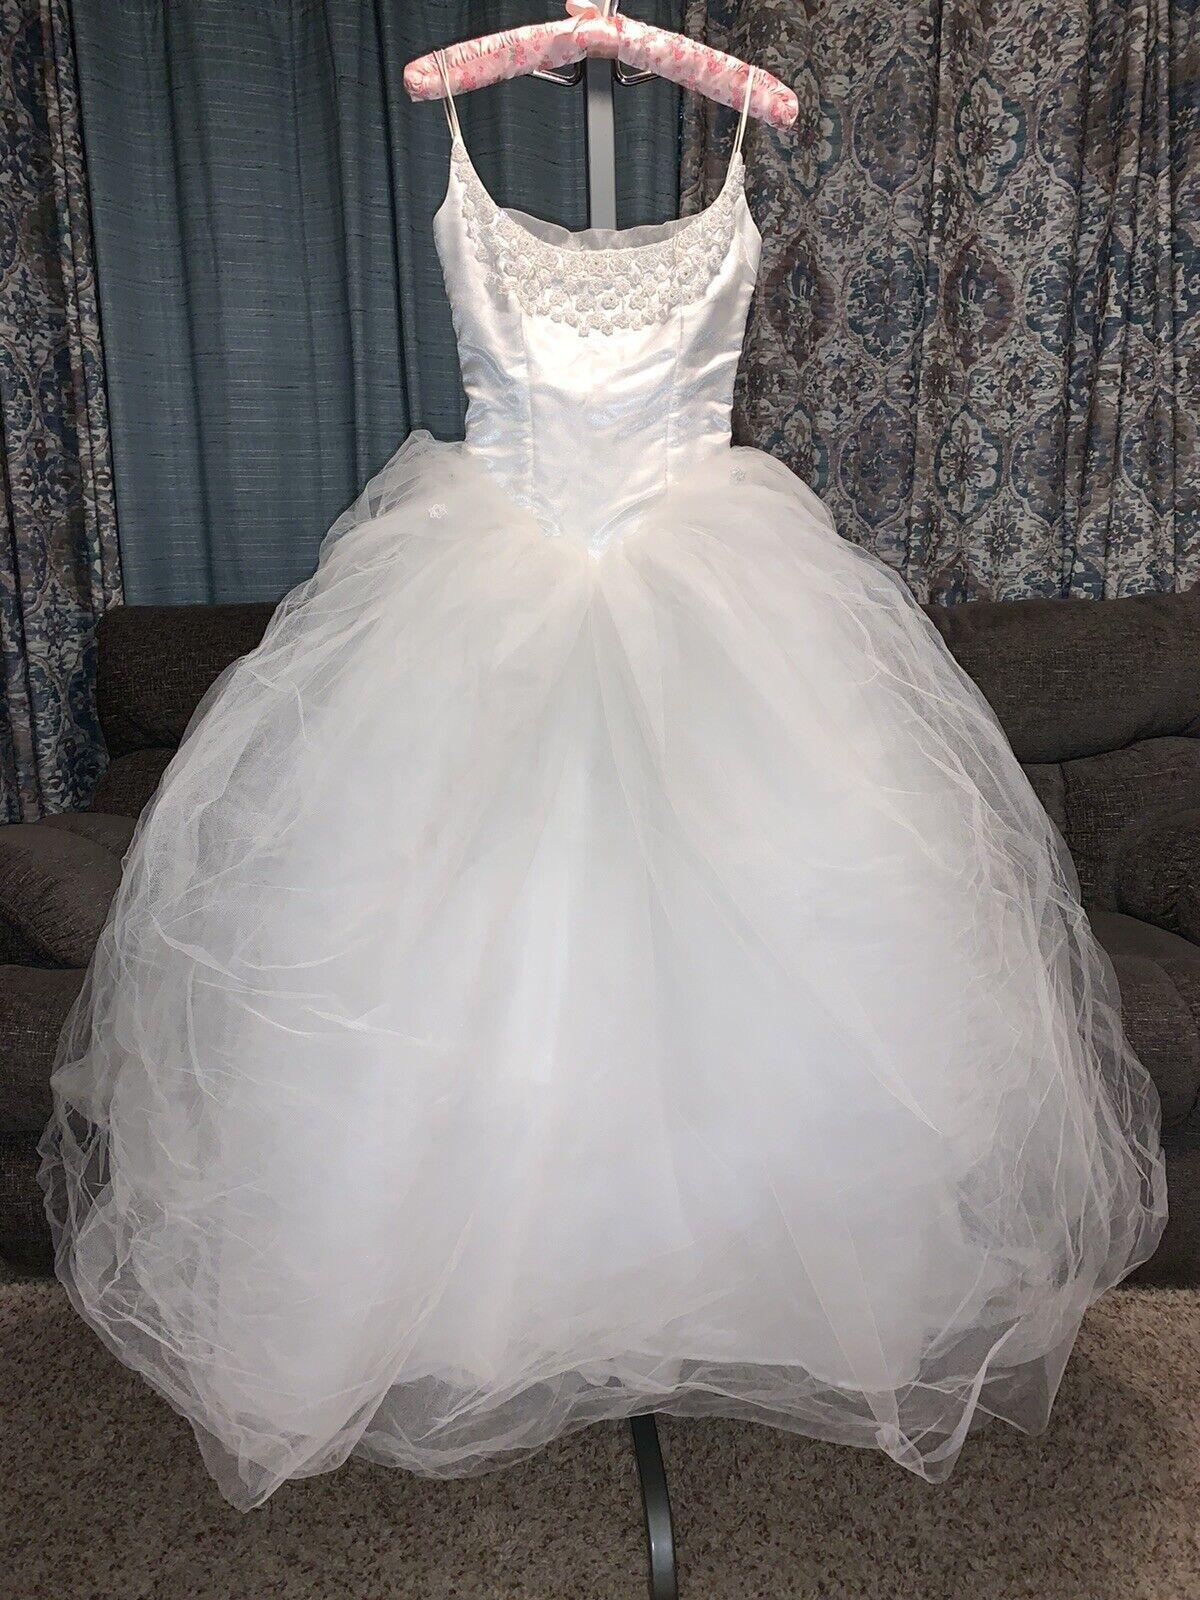 Ballerina style wedding, sweet 16, party dress many options Size 0 XS